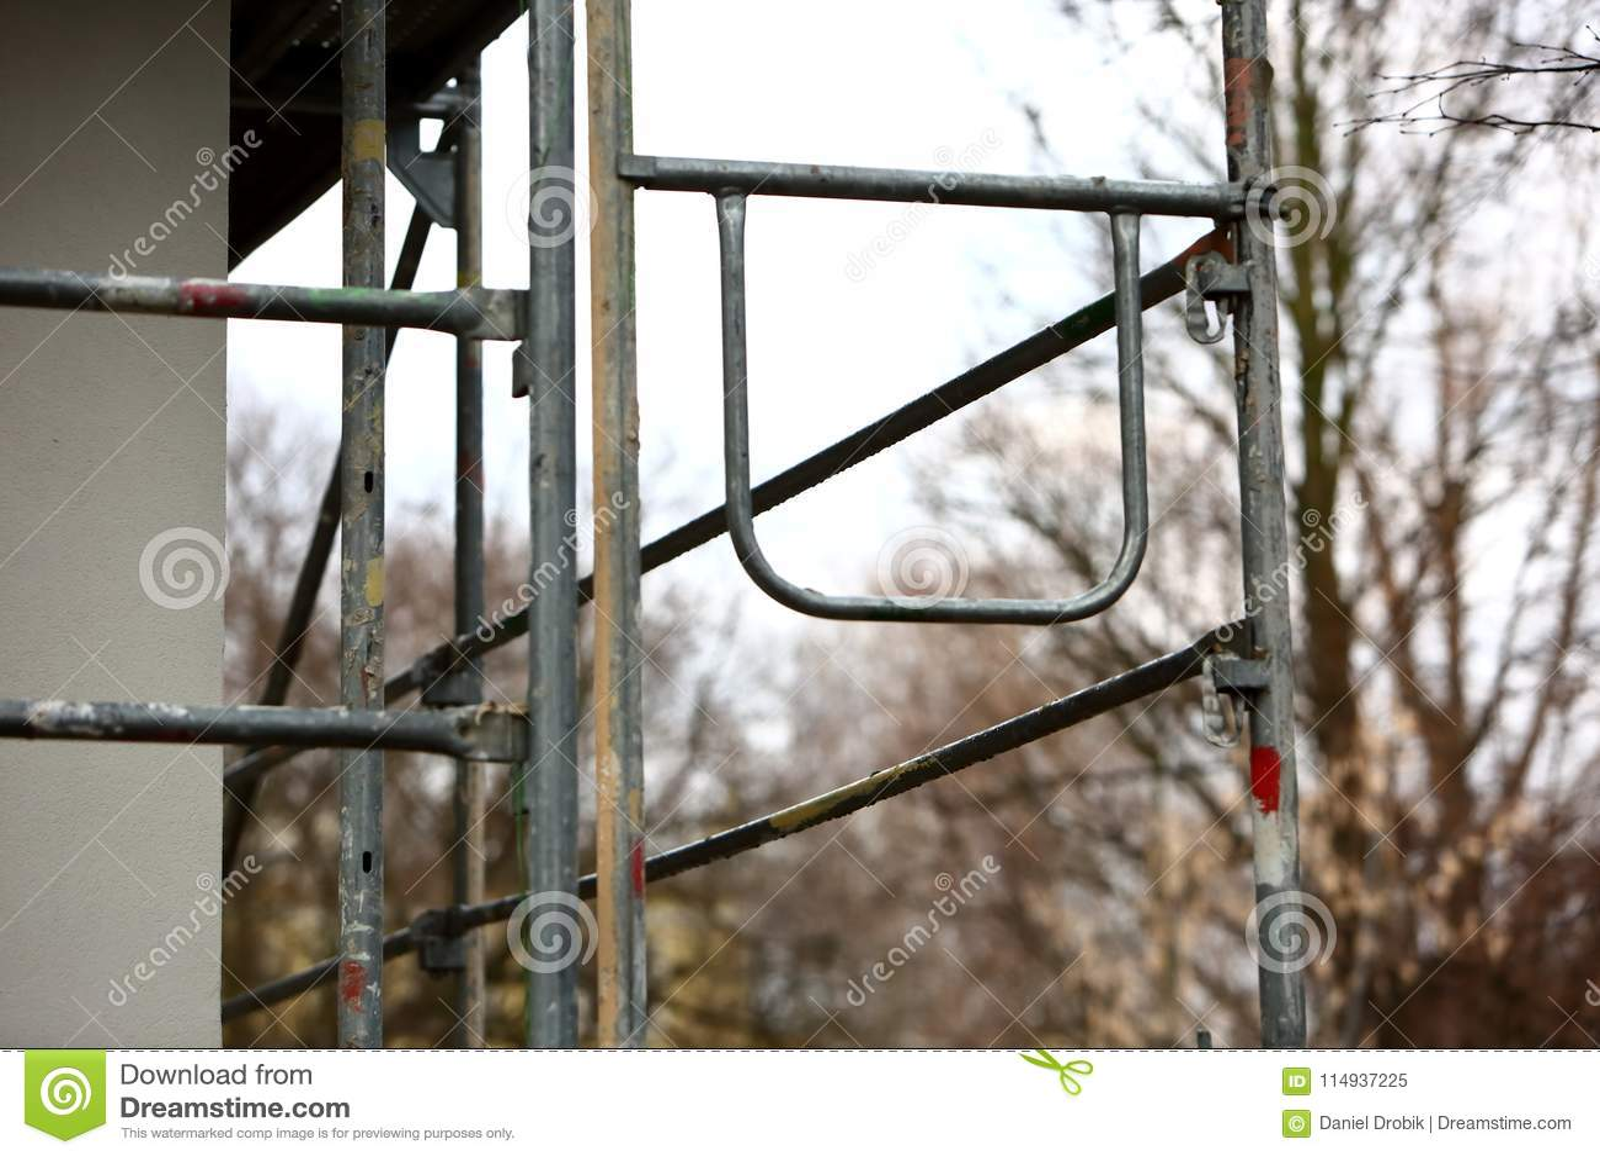 Steel scaffolding used for façade renovation works.